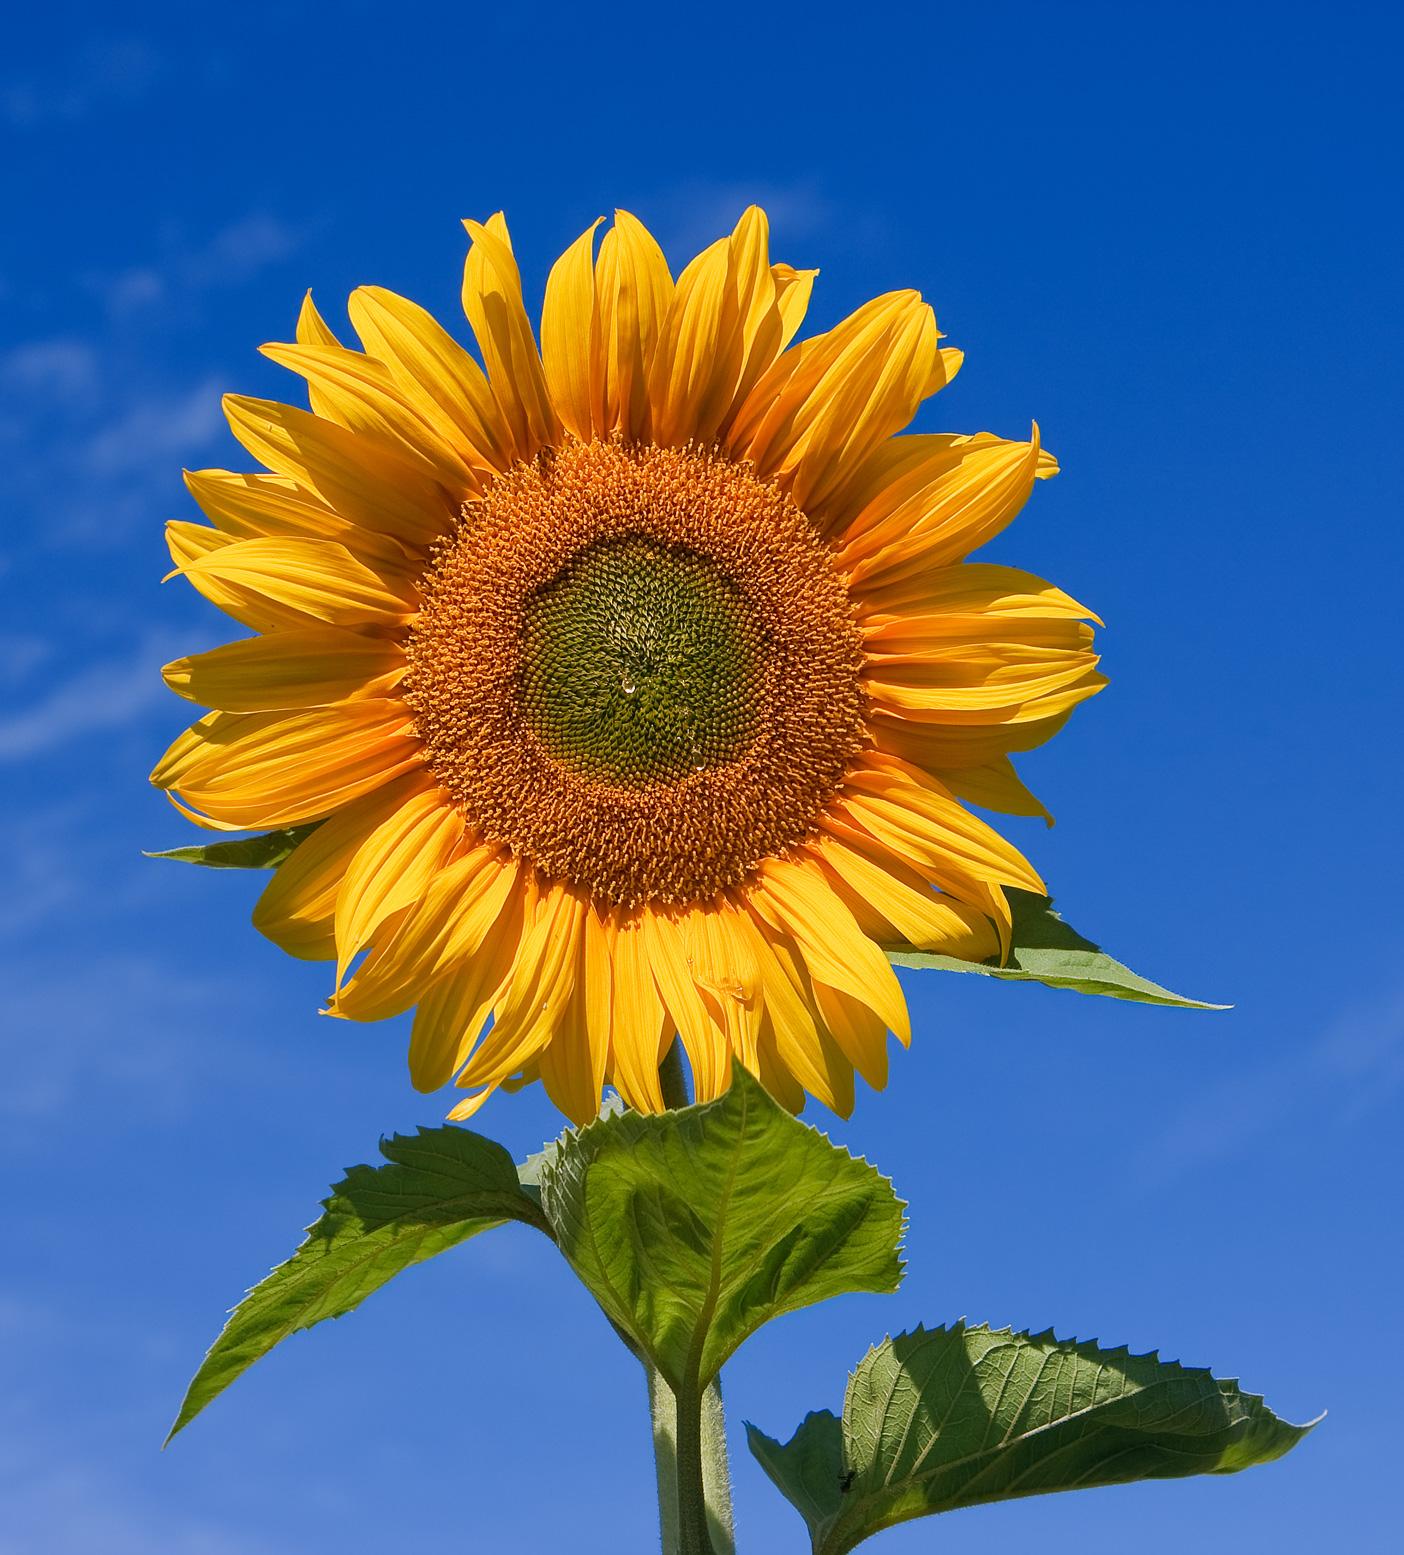 Sunflower daisy sunflower sunfola variety izmirmasajfo